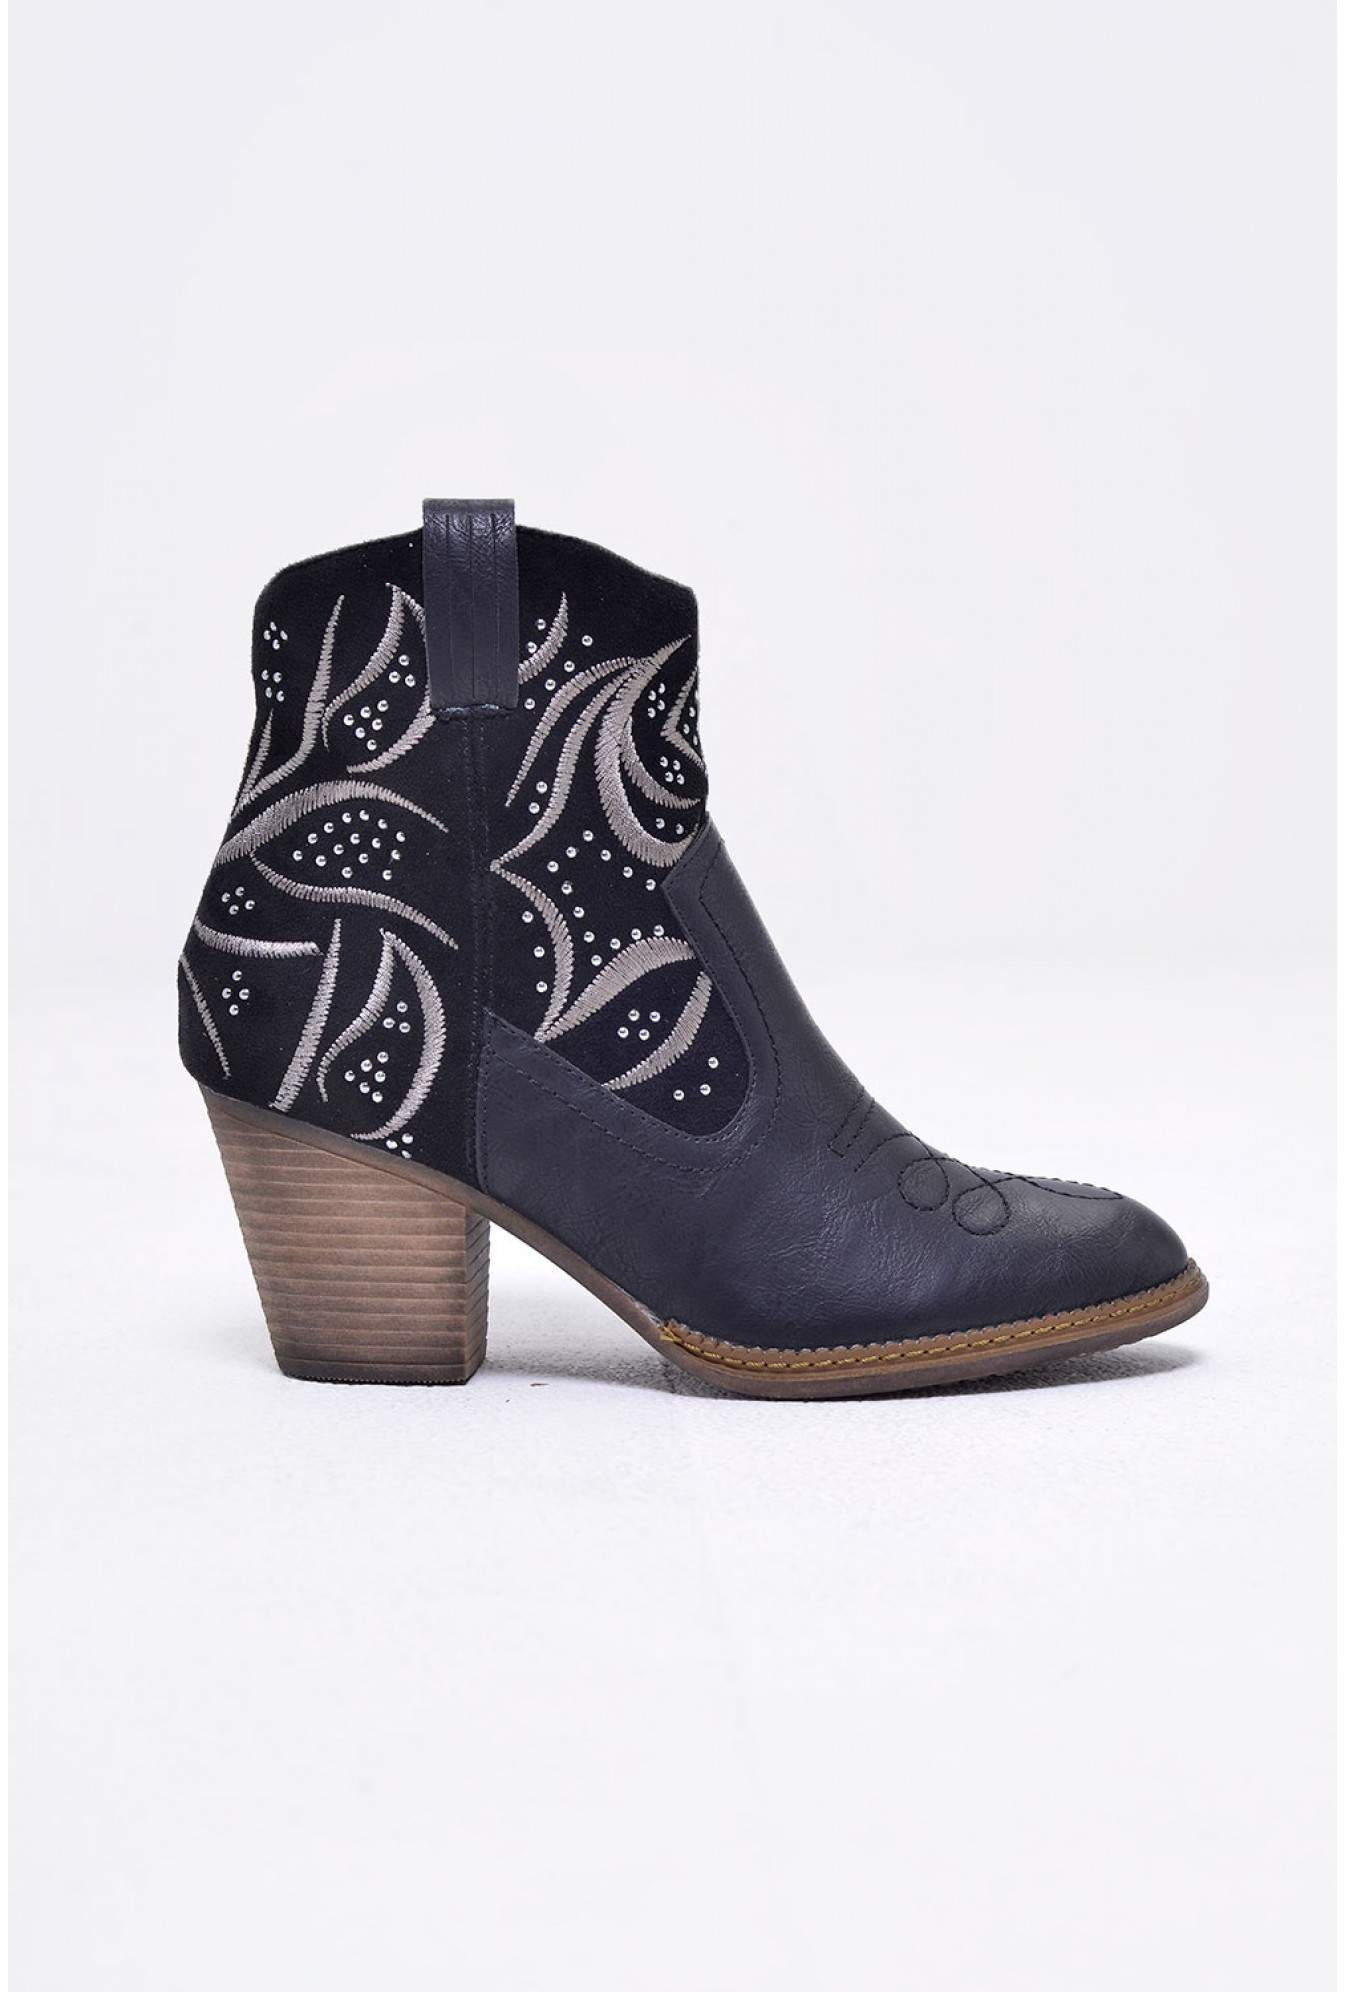 1ddaec219d8 Jessie Western Ankle Boots in Black